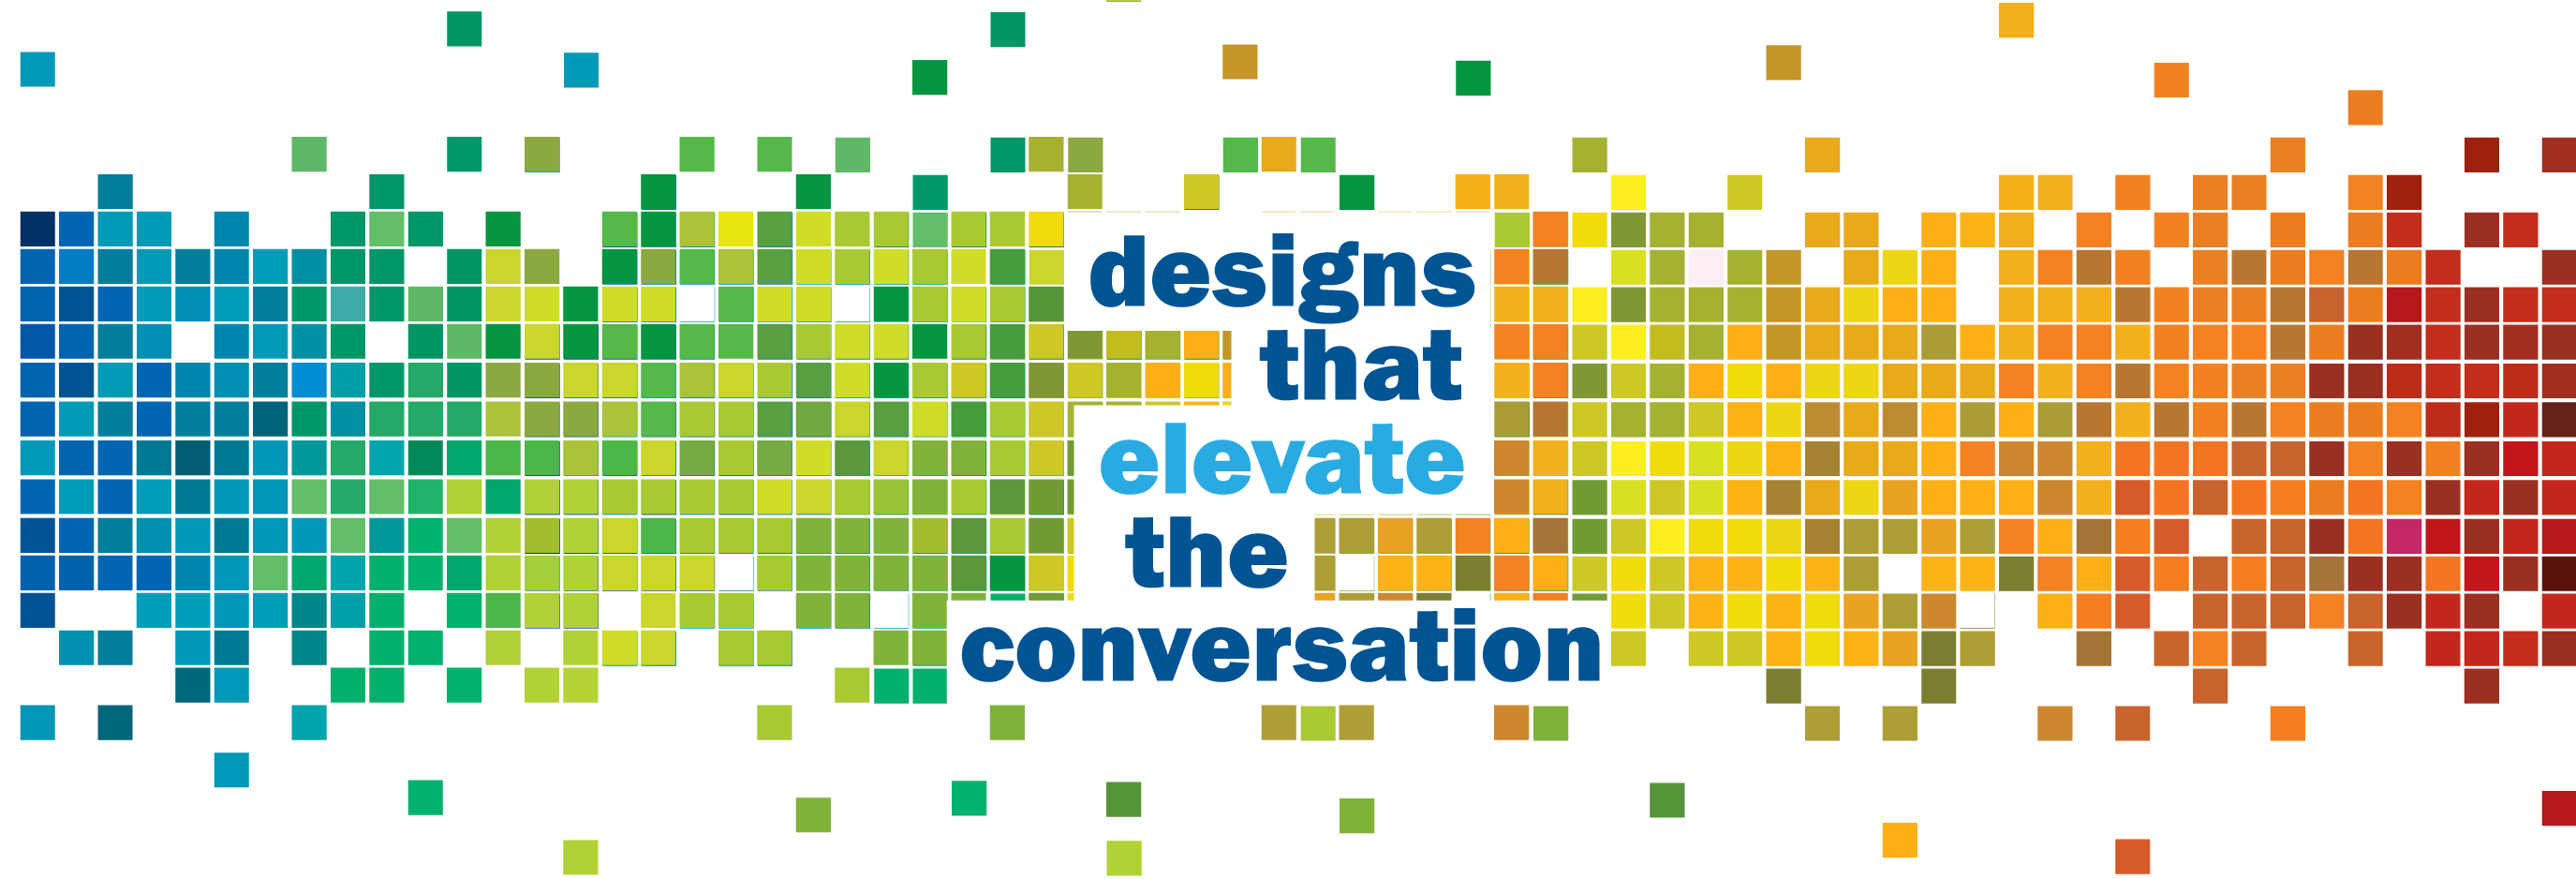 16 Pixel Art Graphic Design Letter Images